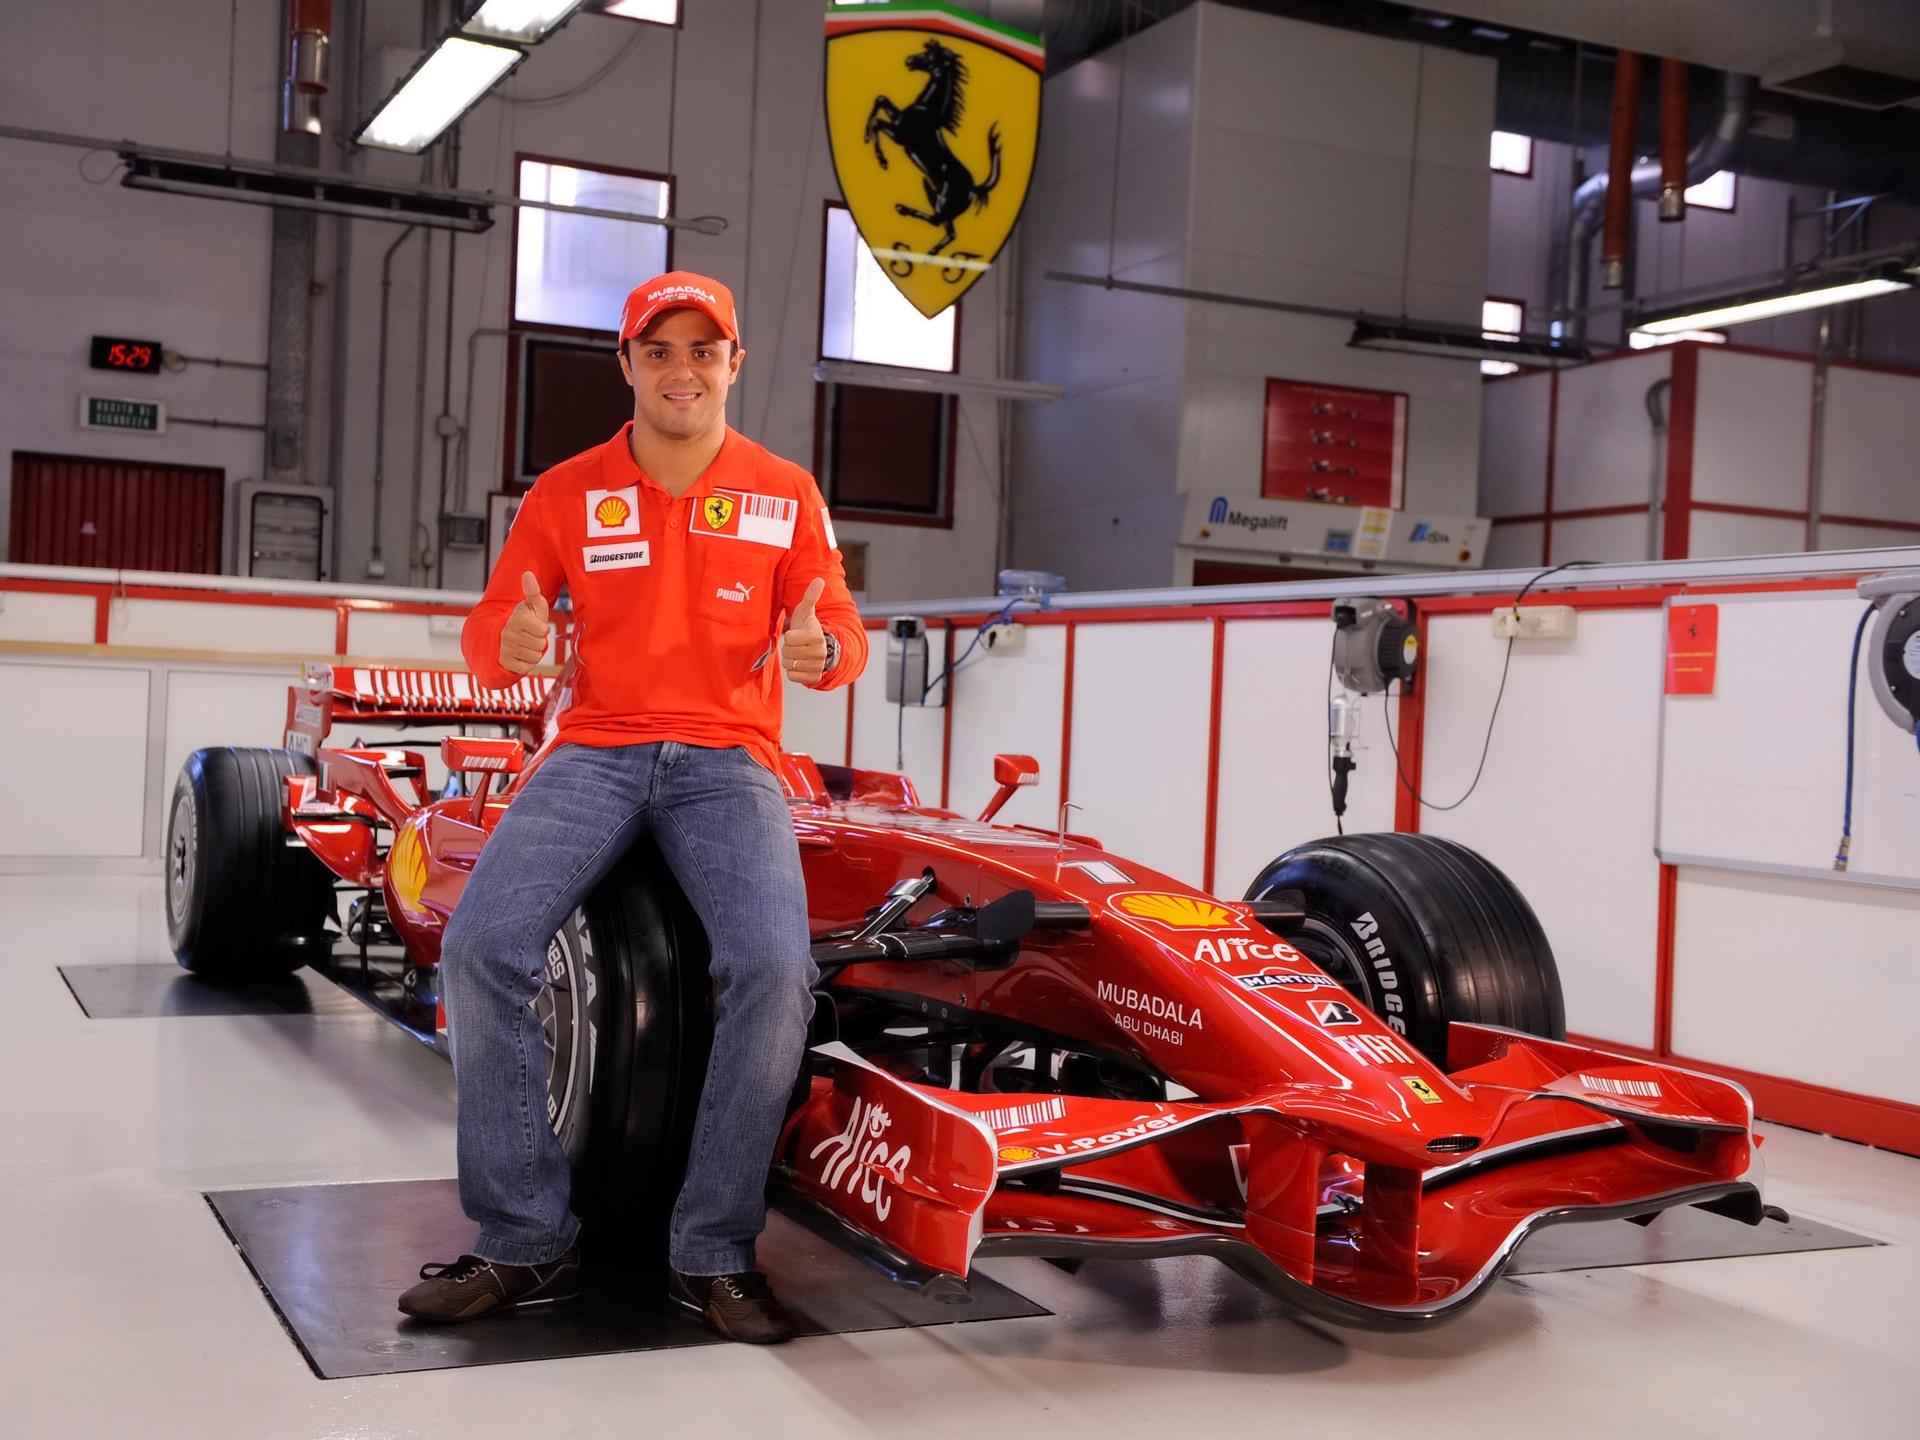 2008-Ferrari-F2008-Felipe-Massa-1920x1440.jpg